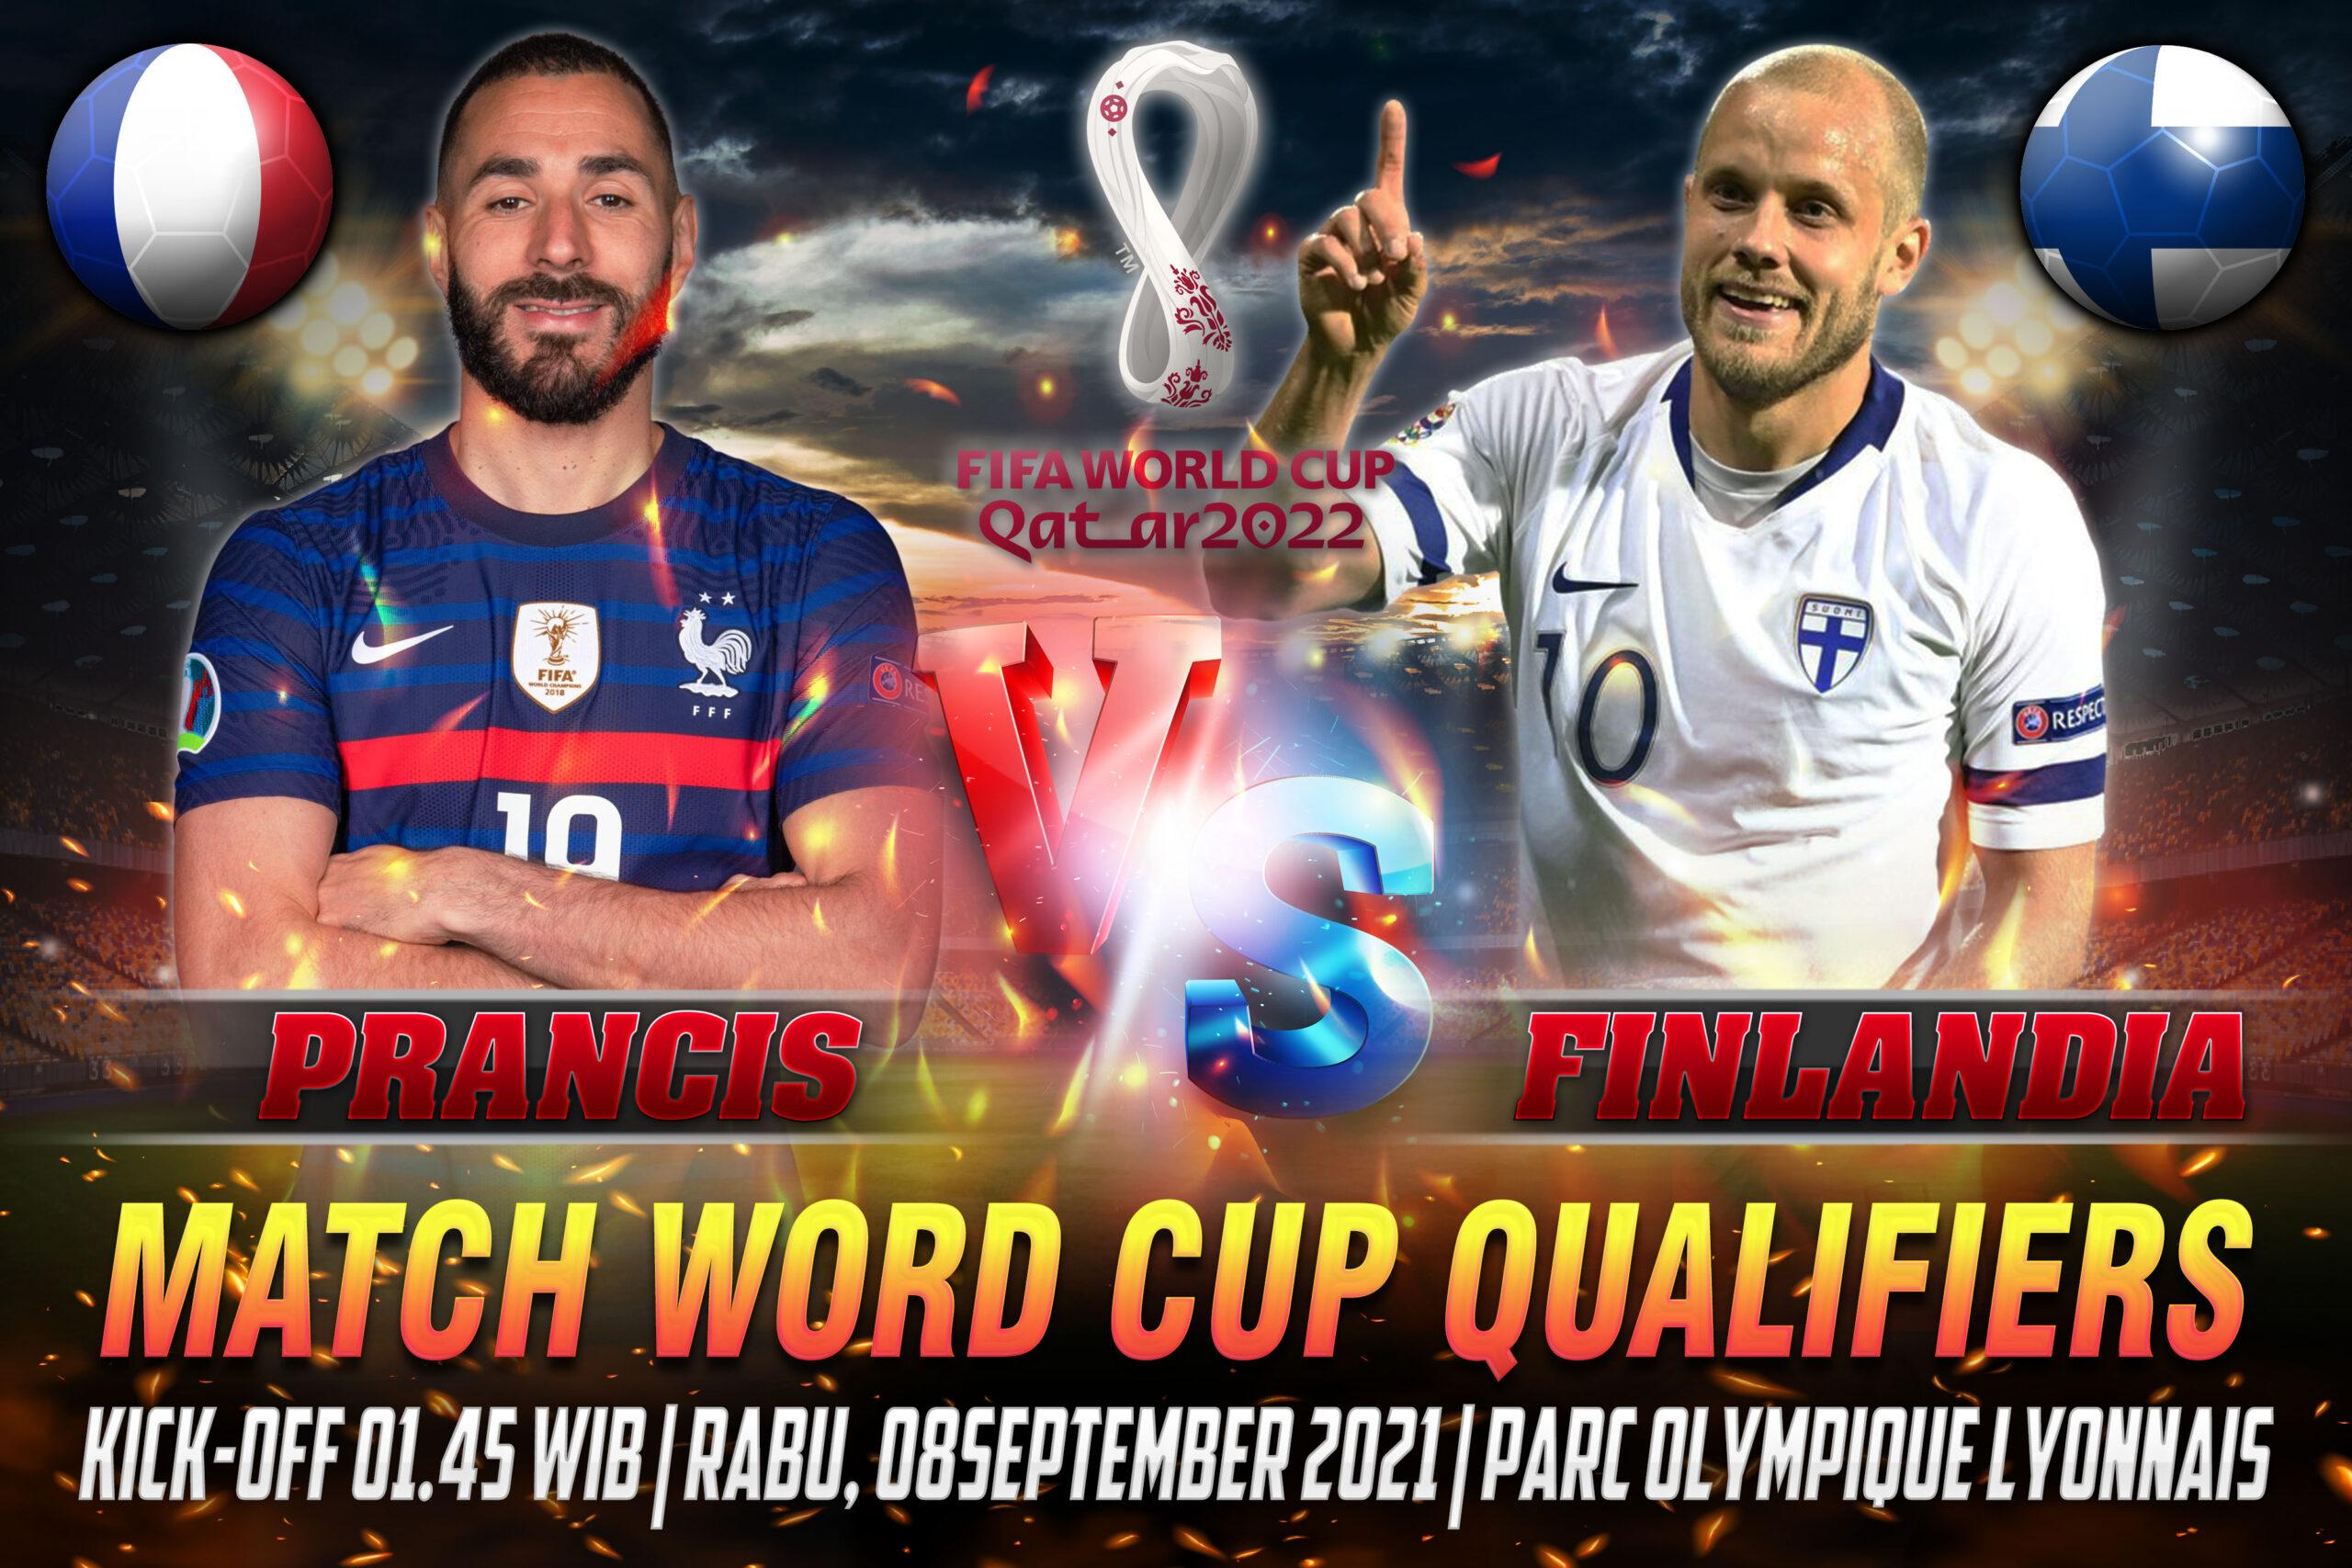 Prediksi Skor Prancis vs Finlandia Word Cup Qualifiers